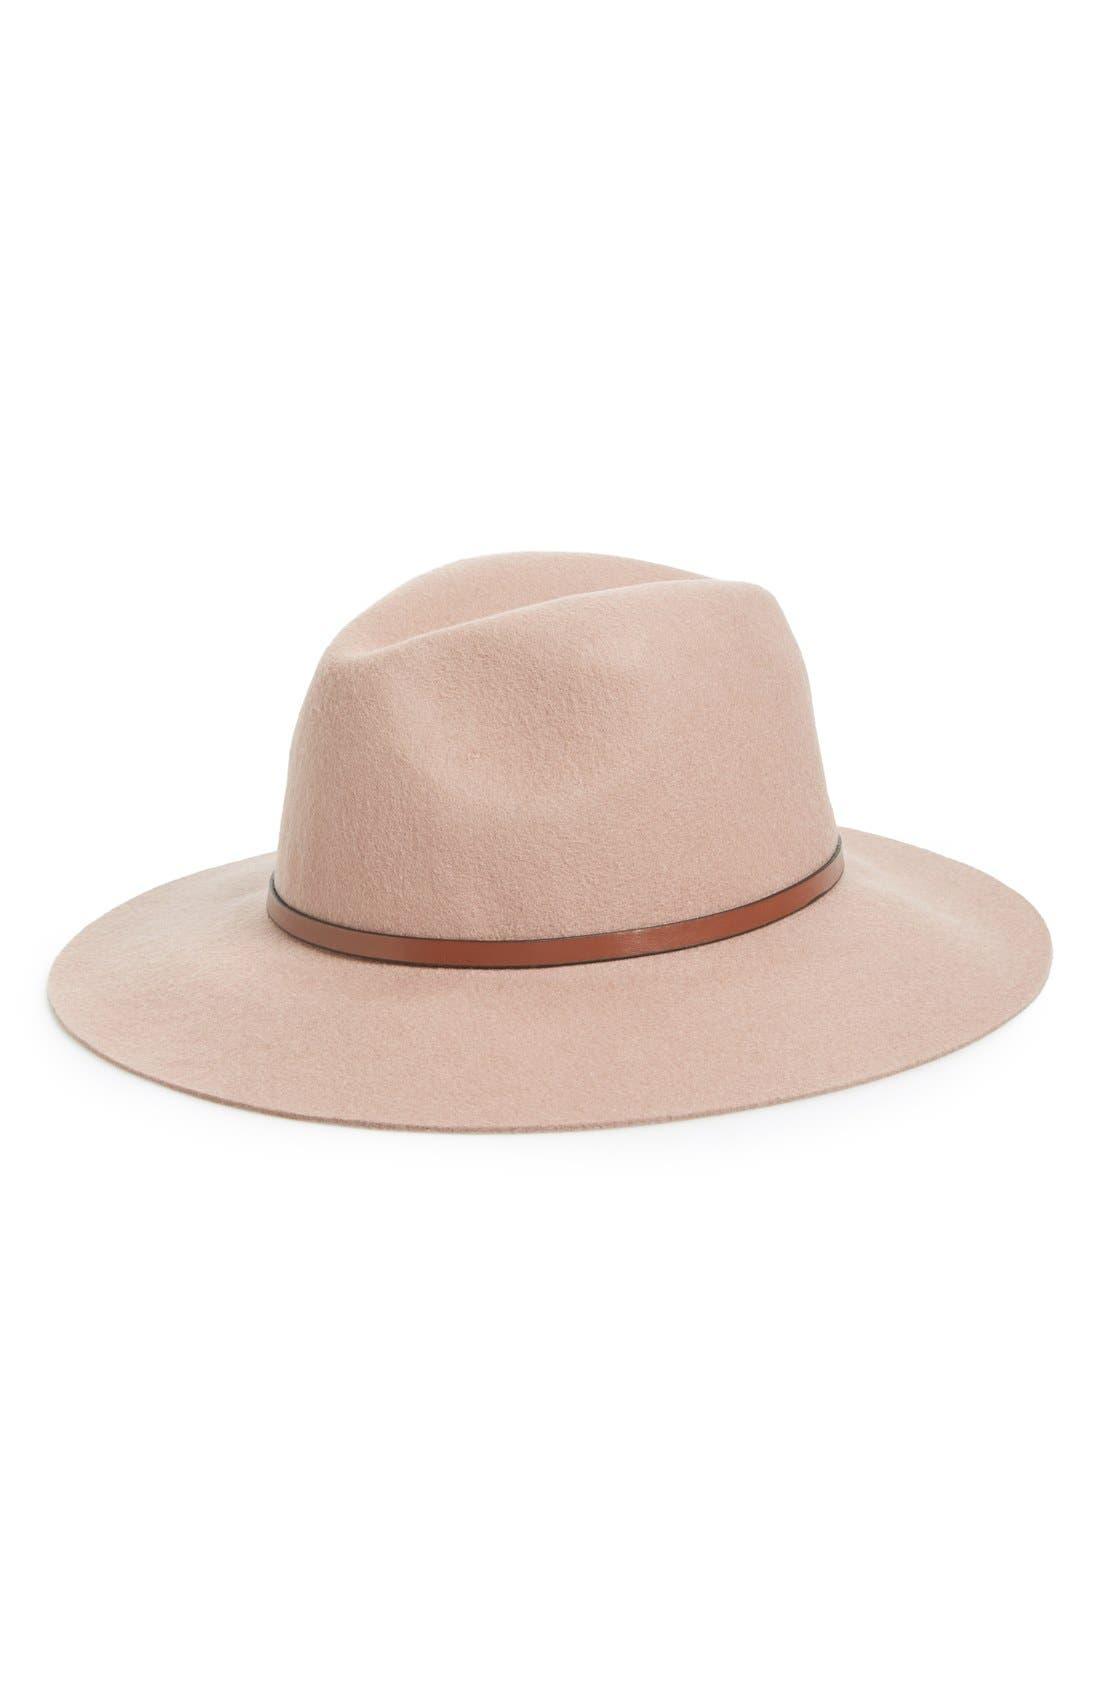 Main Image - Hinge Faux Leather Trim Wool Felt Panama Hat